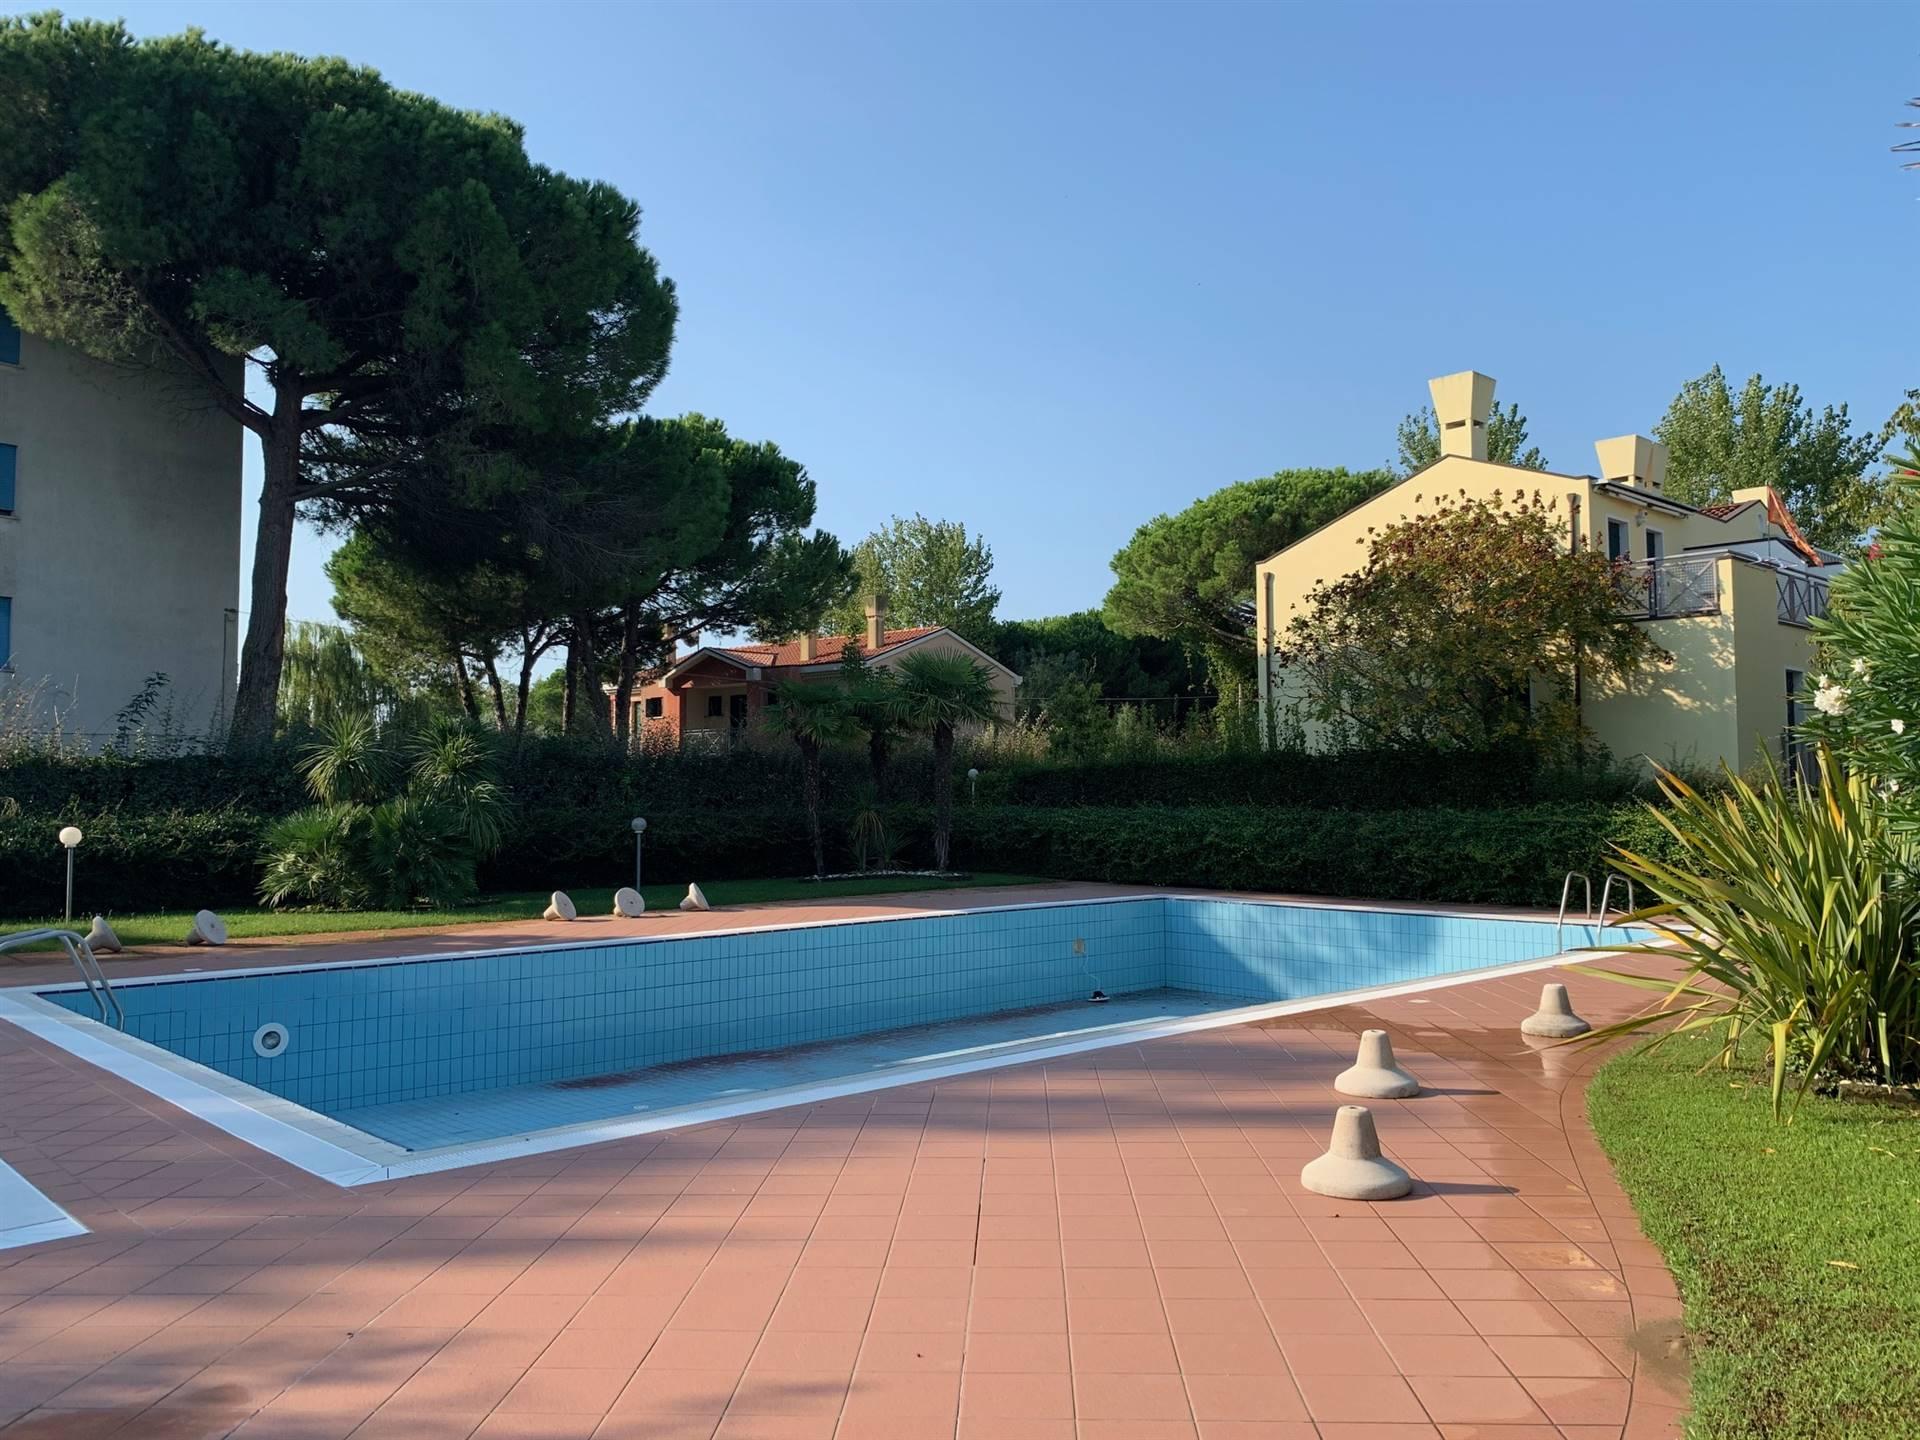 piscina villetta Cà di Valle euro 248.000 Studio C